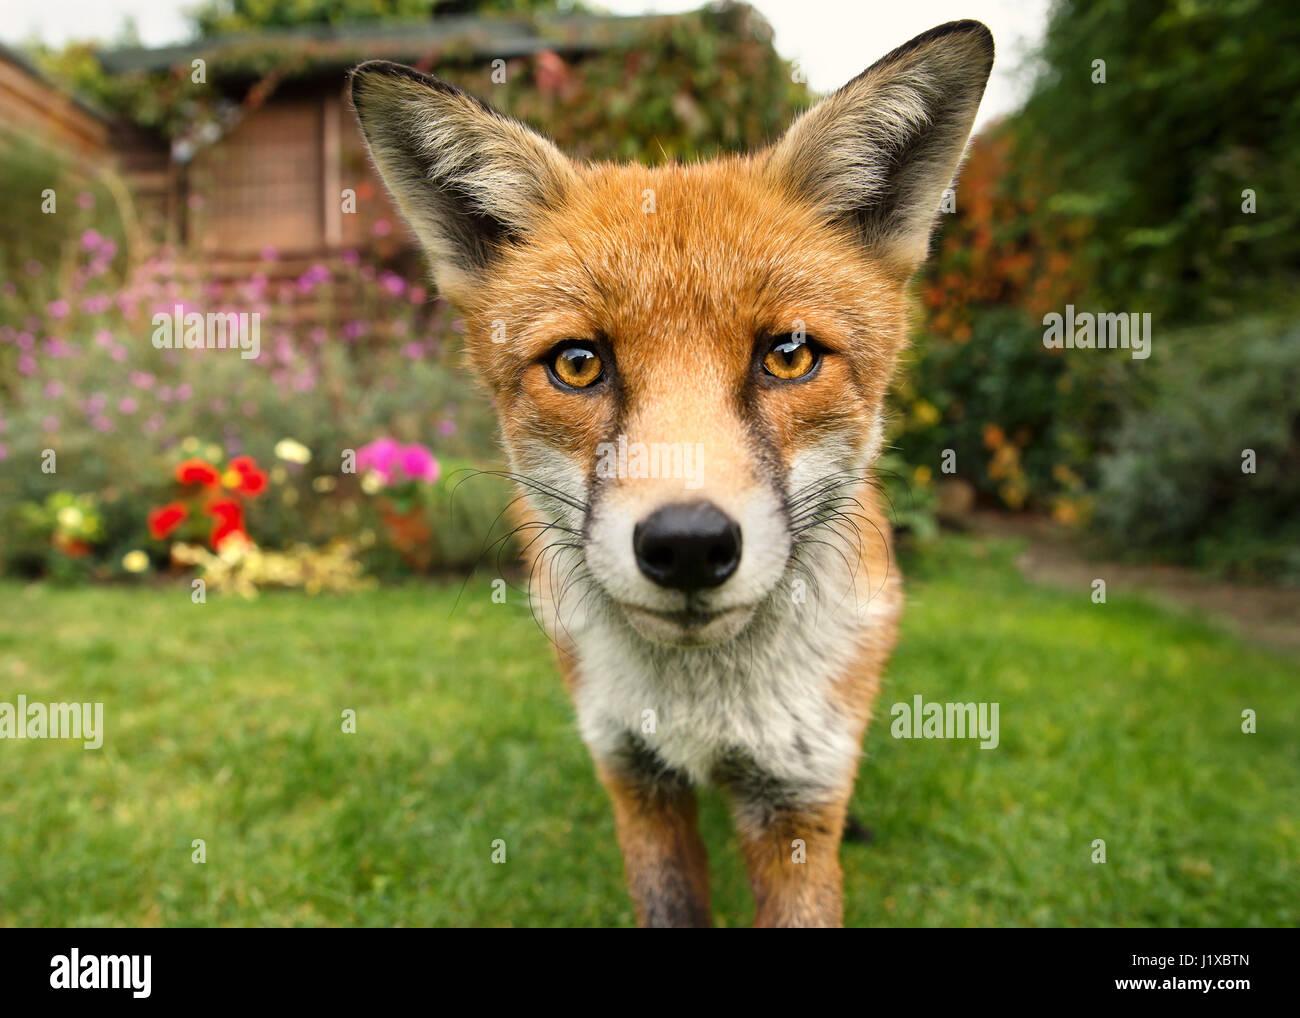 Portrait of red fox - Stock Image